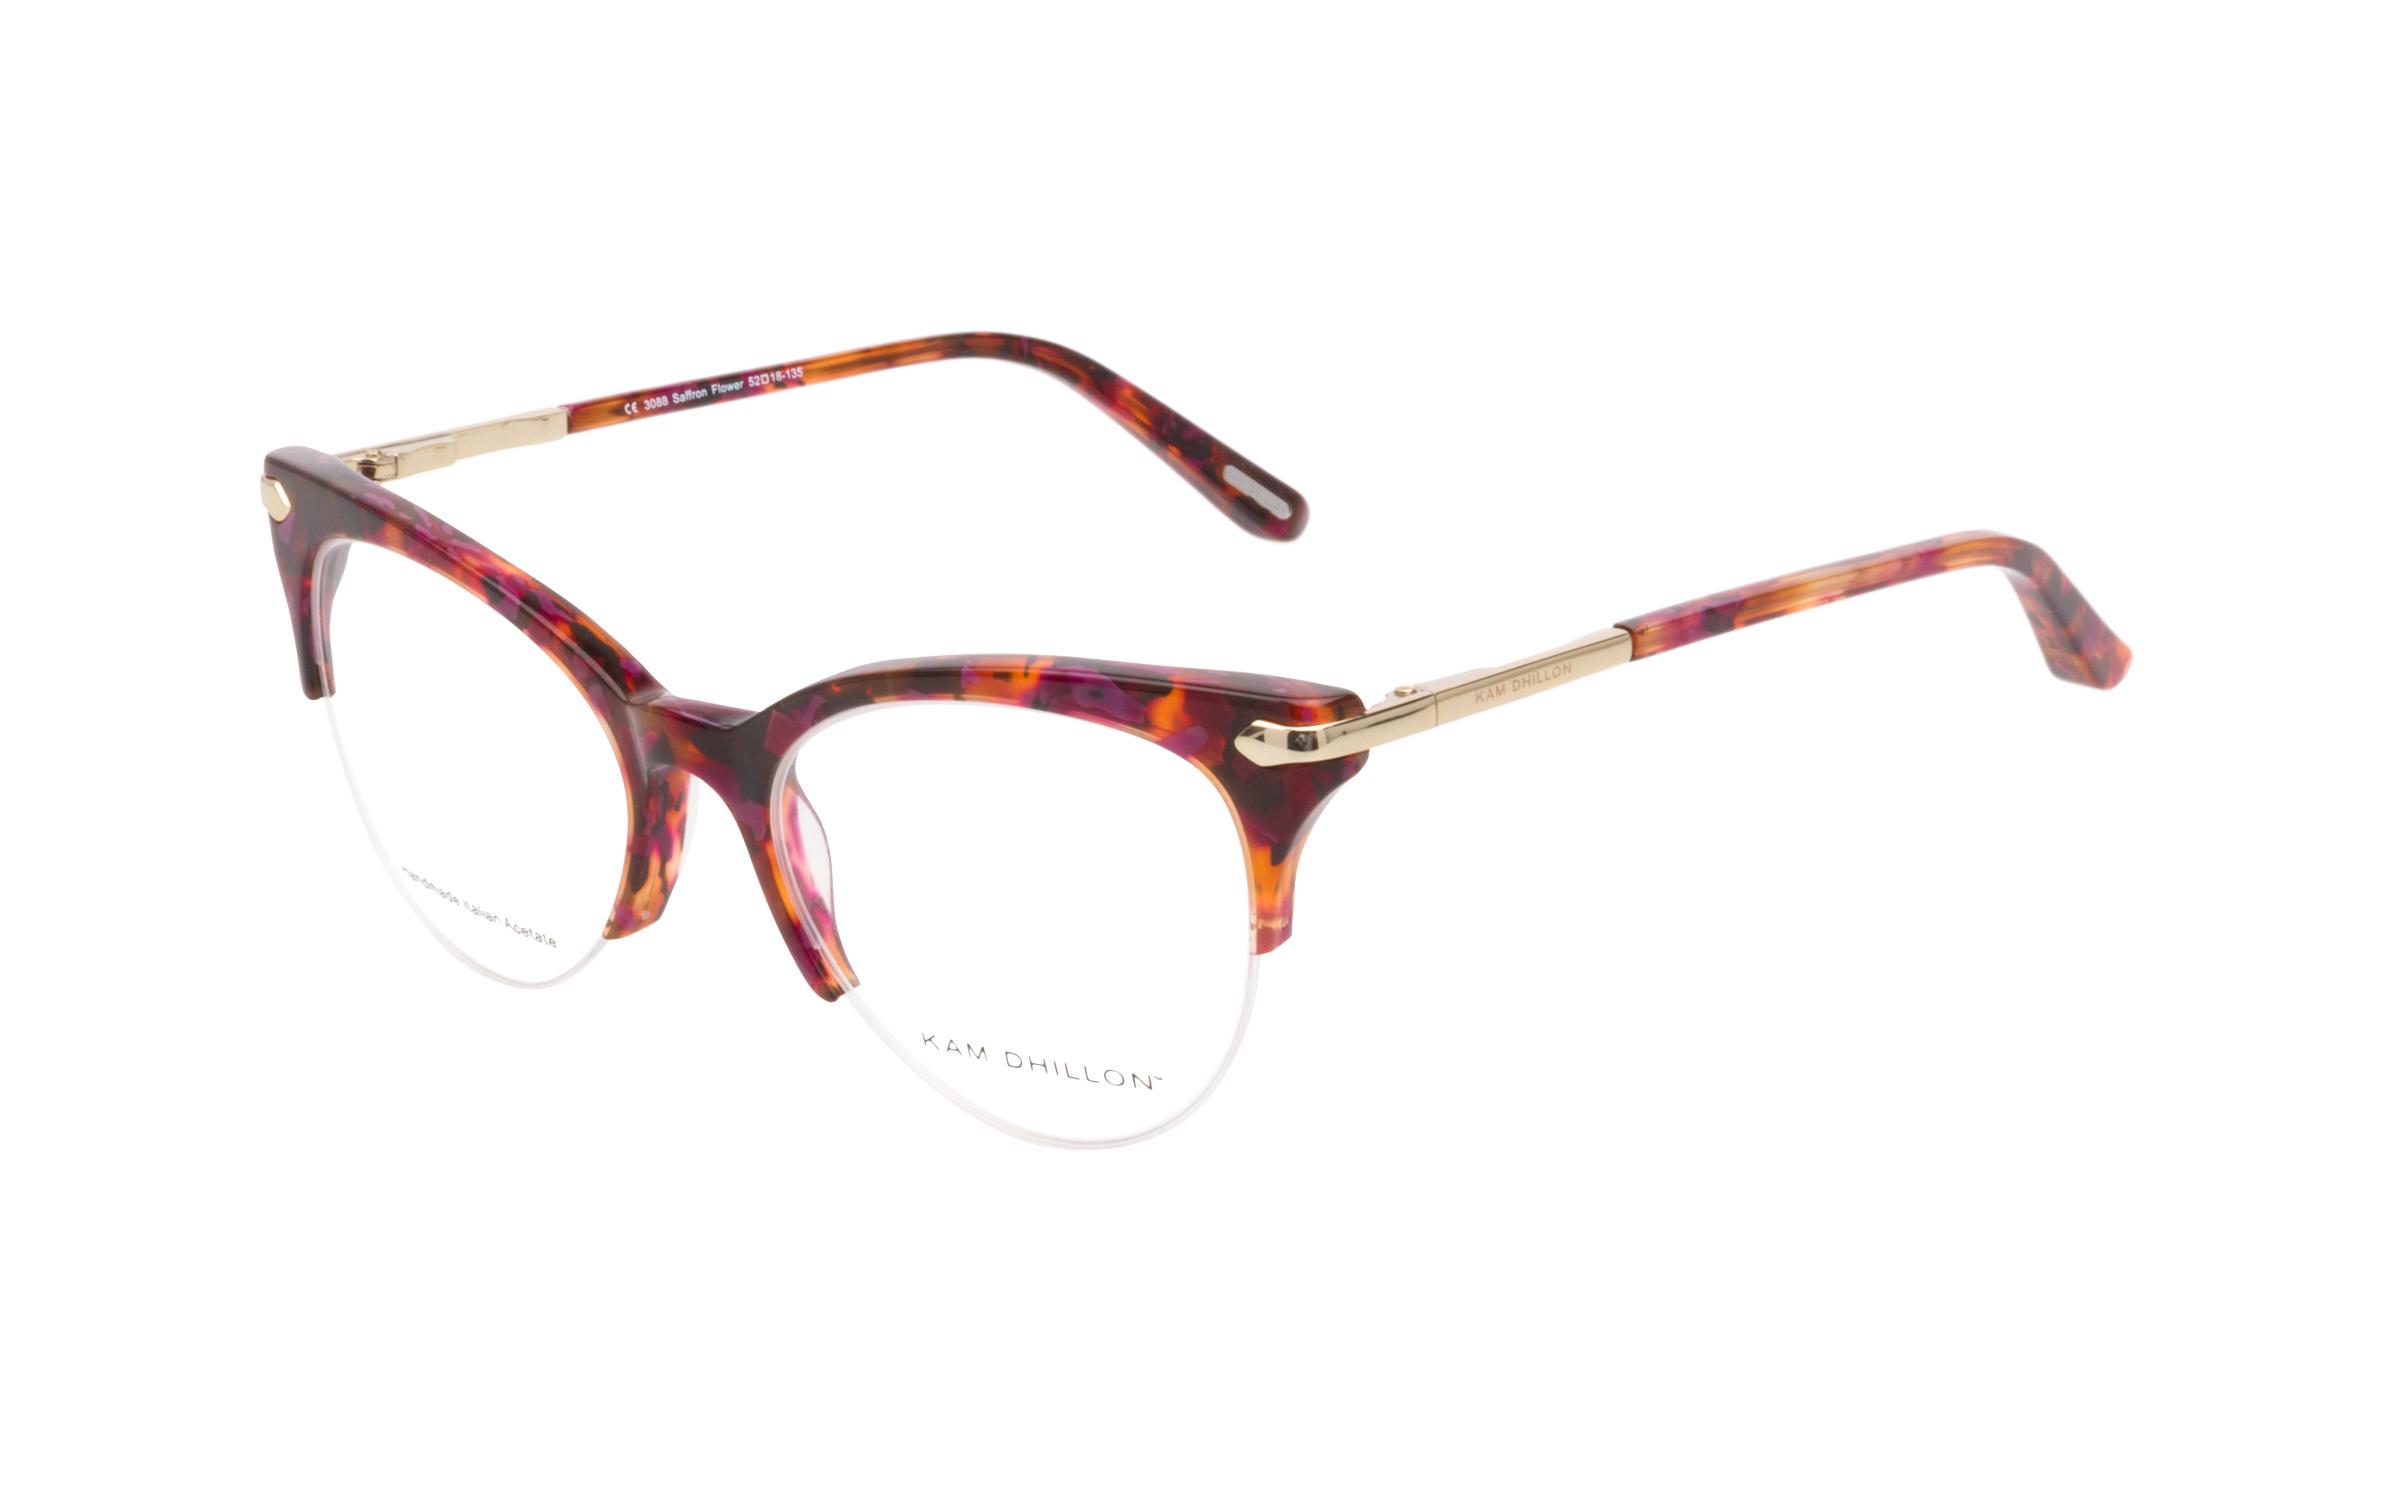 Women's Vintage Glasses Tortoise/Purple Kam Dhillon Online Clearly